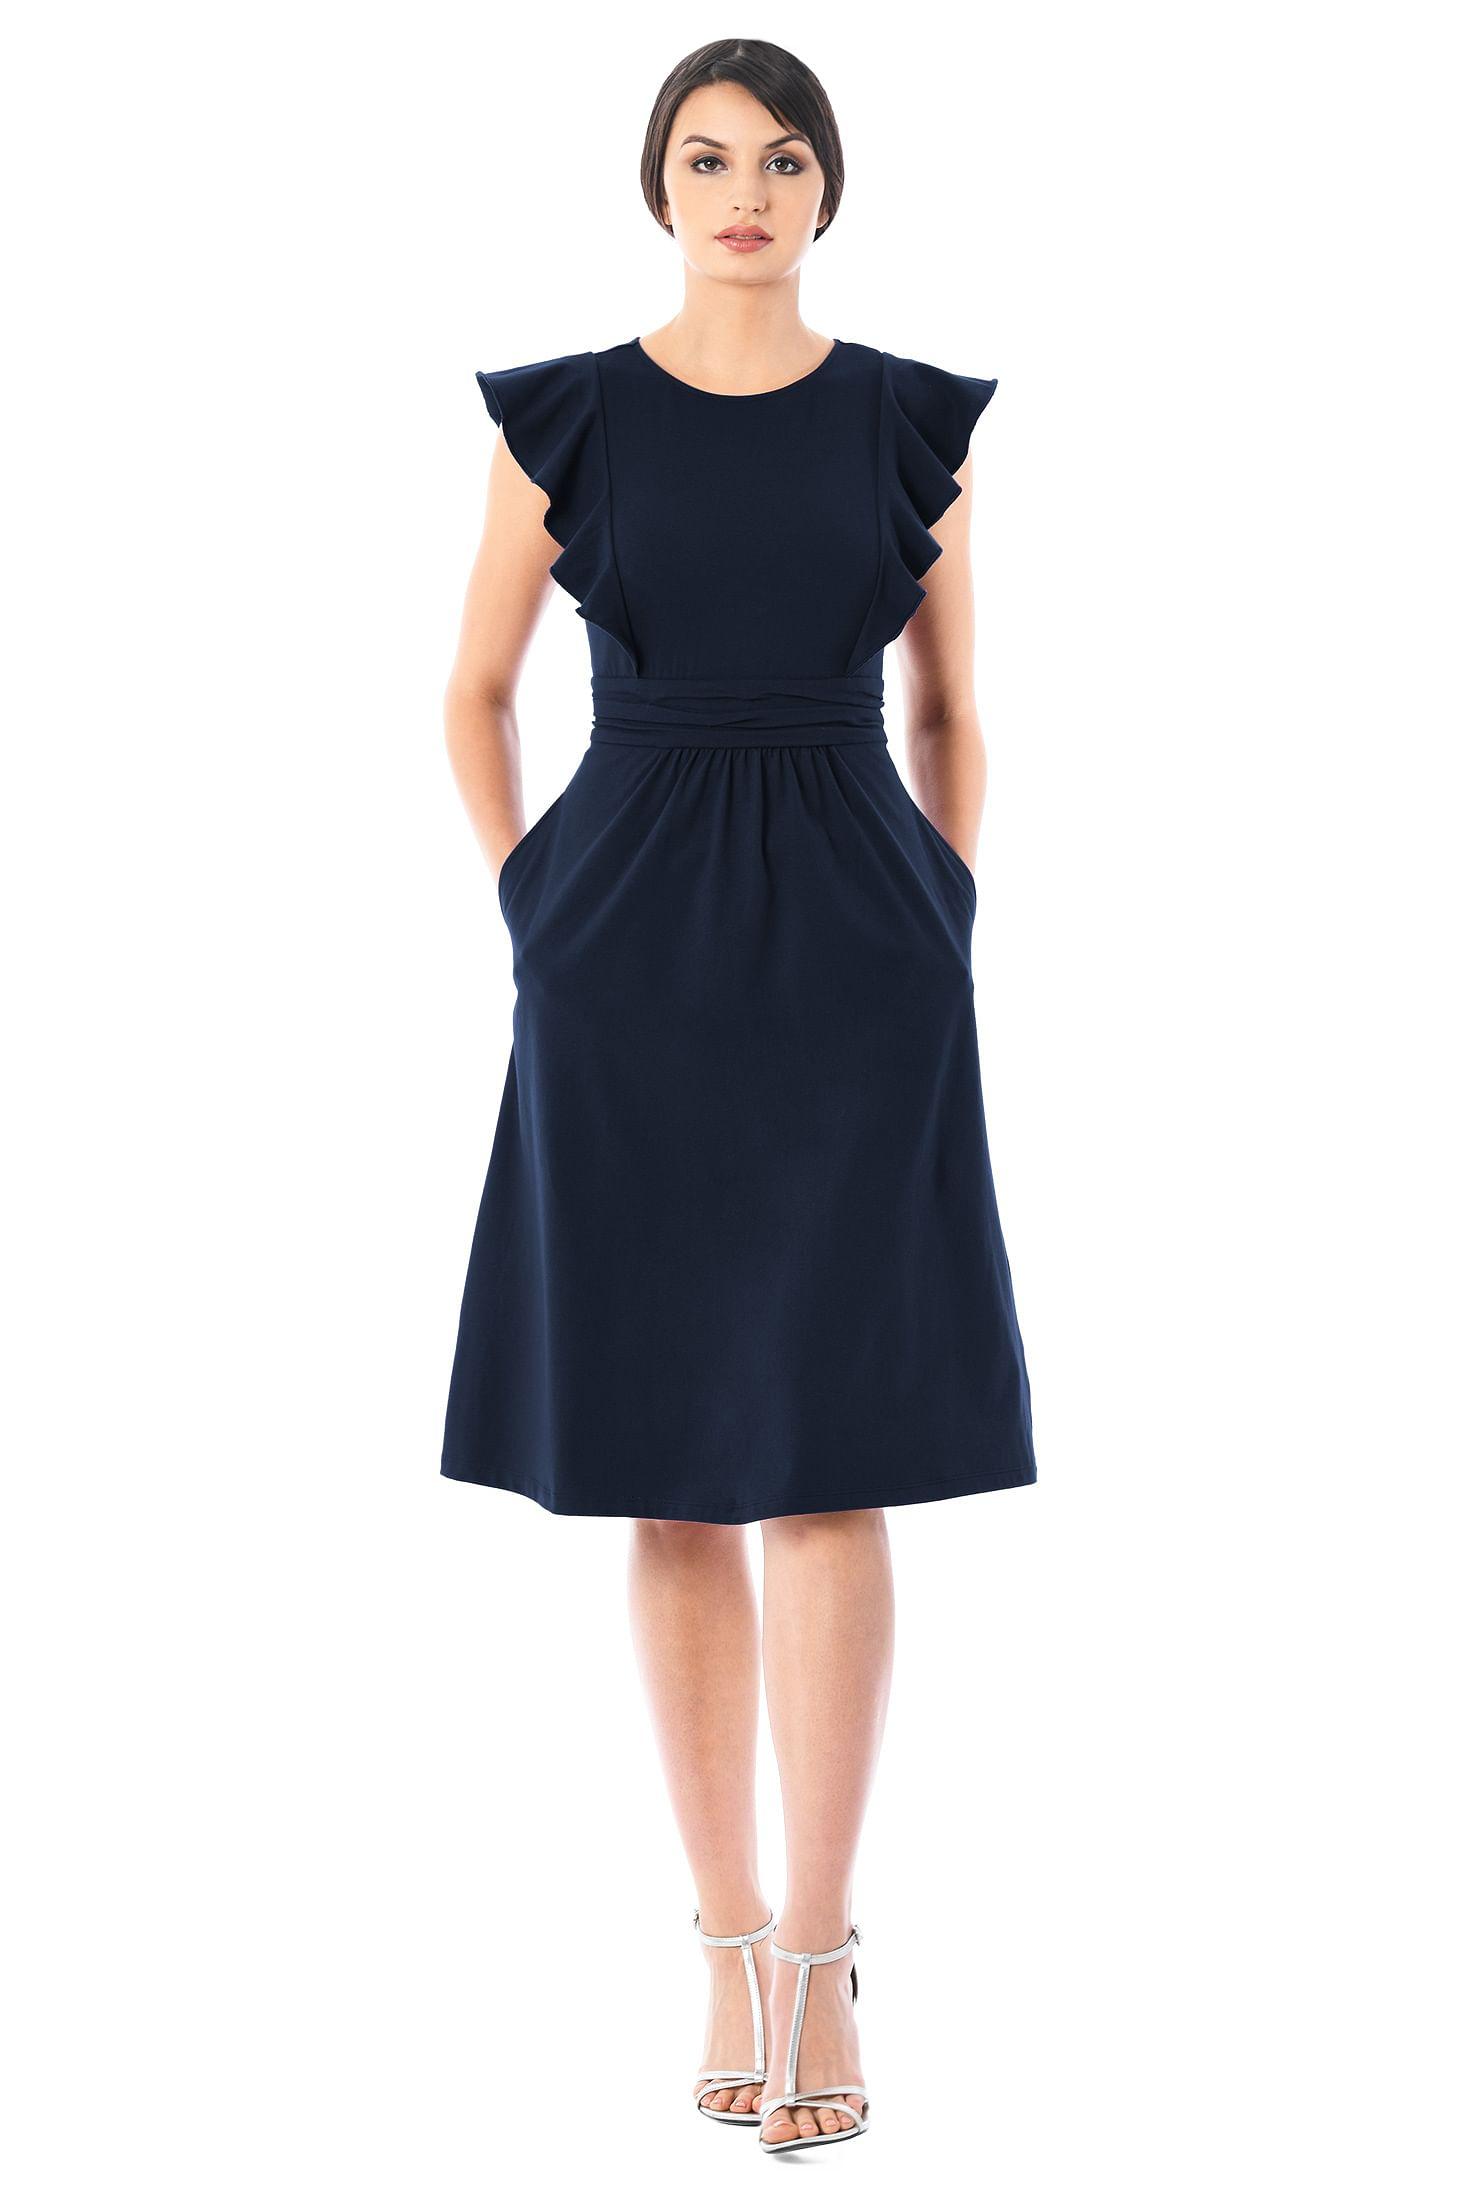 0af4dd17d ... Ruffle sleeves cotton knit dress. , below knee length dresses,  cotton/spandex Dresses, day dresses, Deep Navy